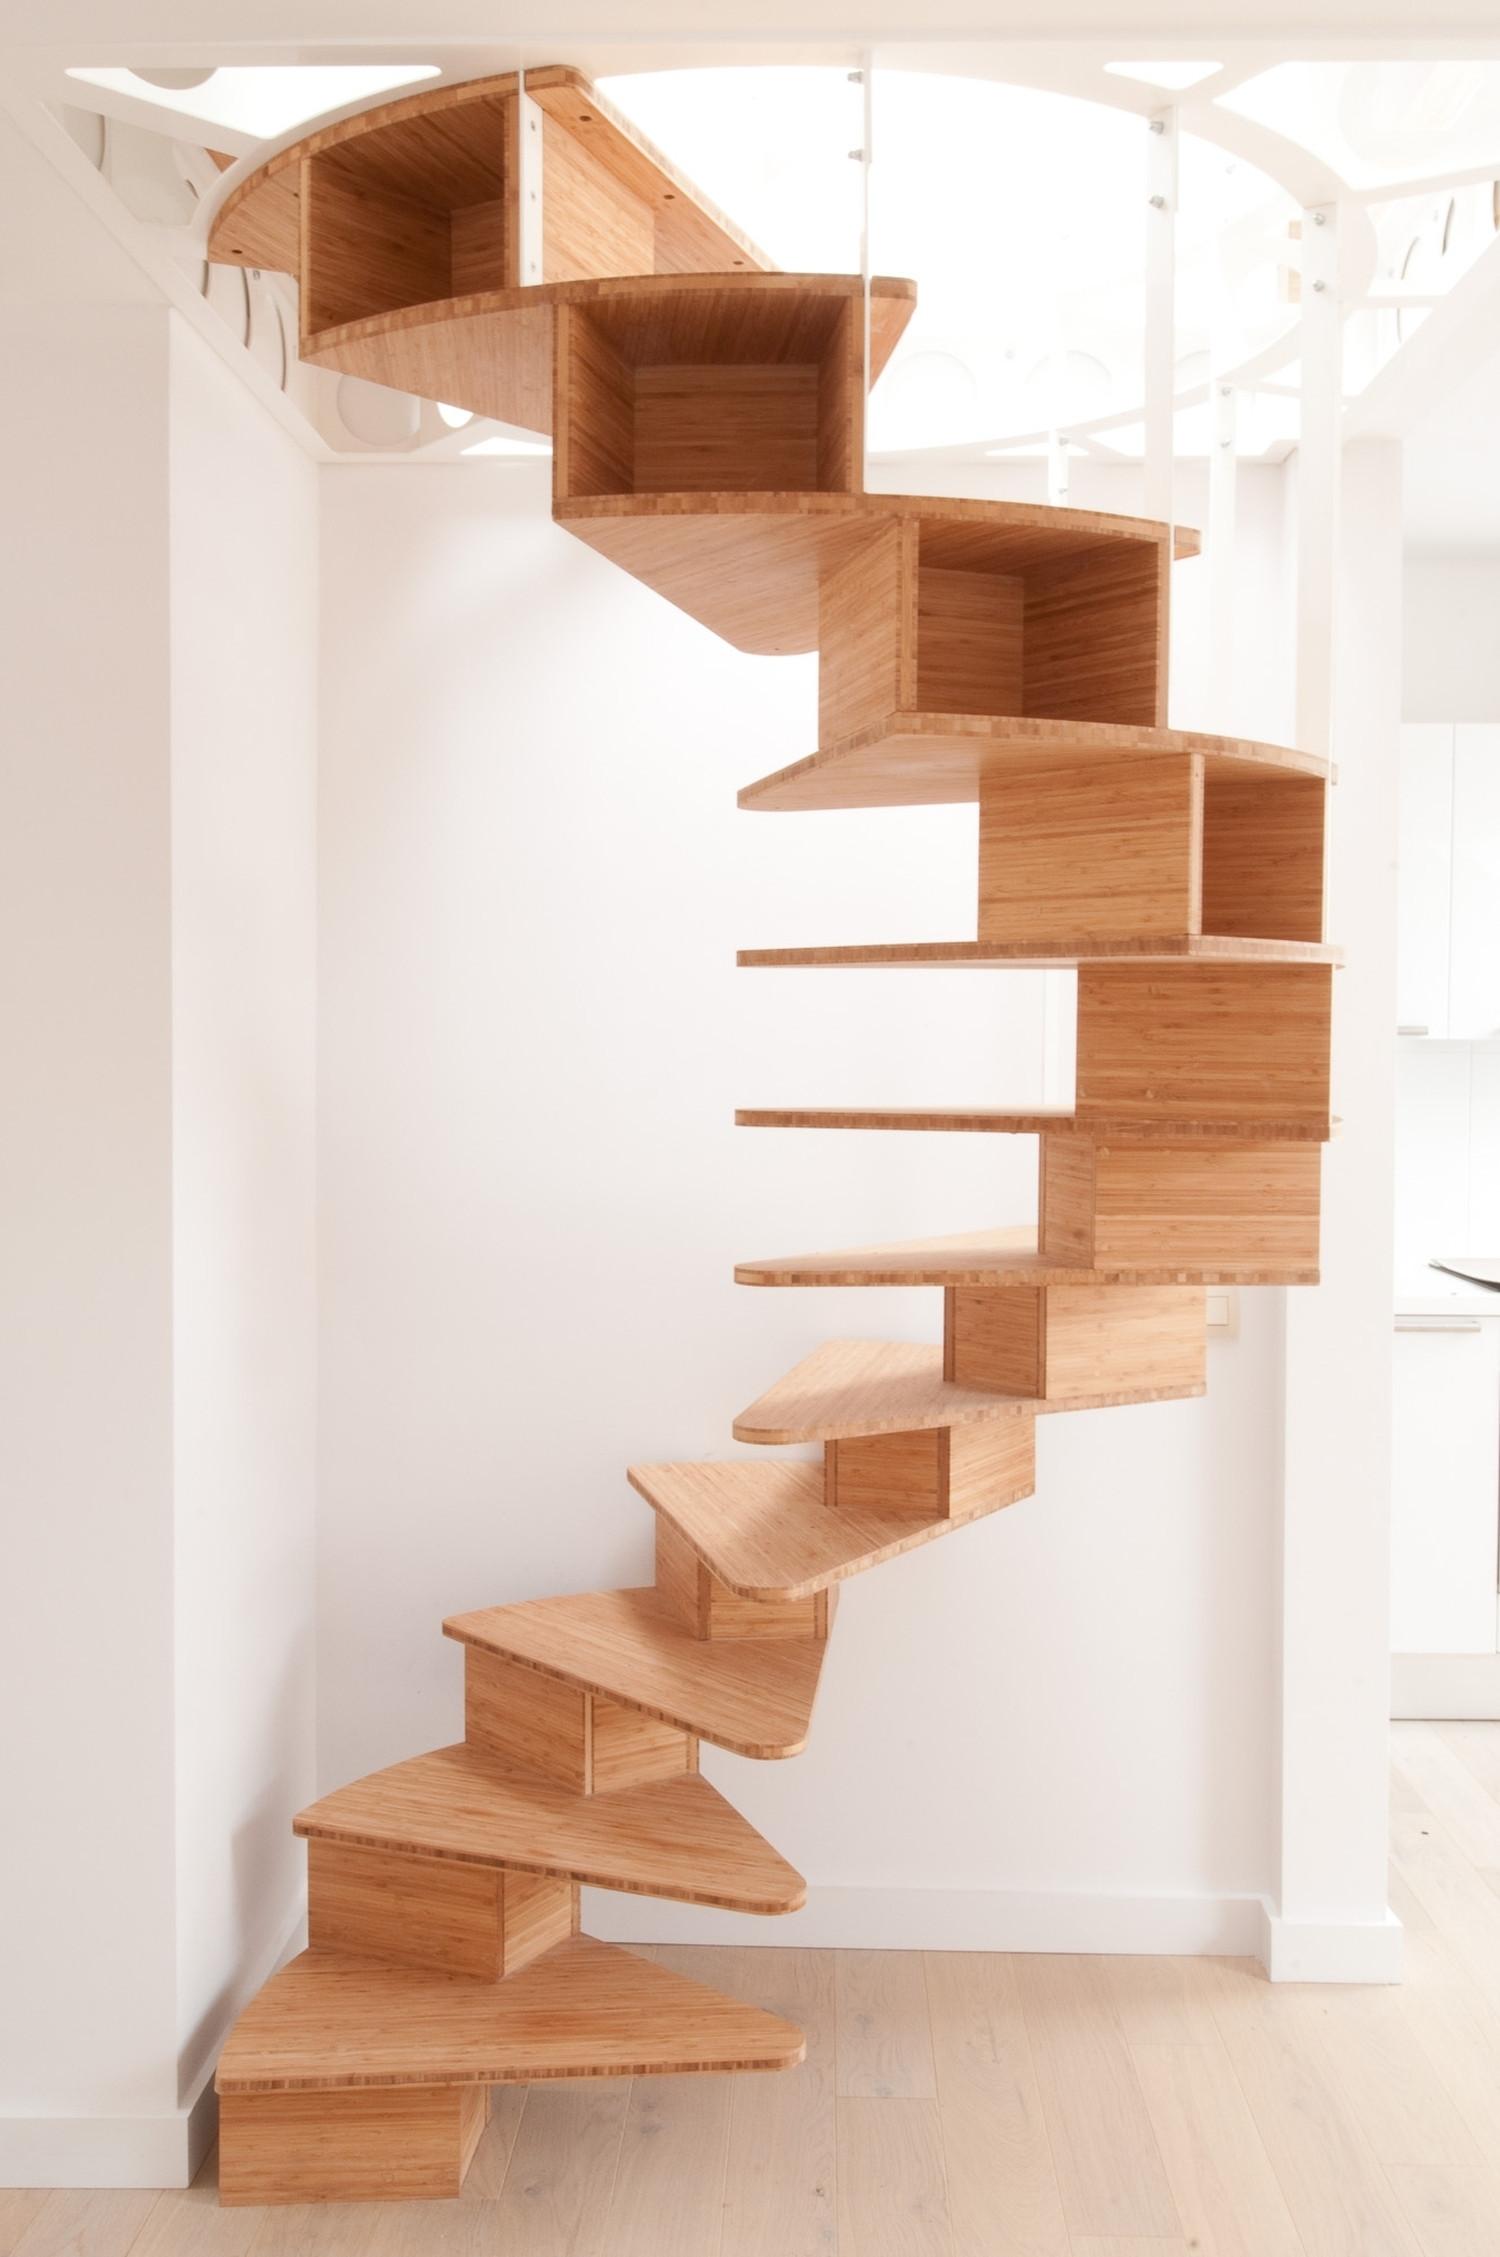 olmo spiral staircase by jo a karmatrendz. Black Bedroom Furniture Sets. Home Design Ideas